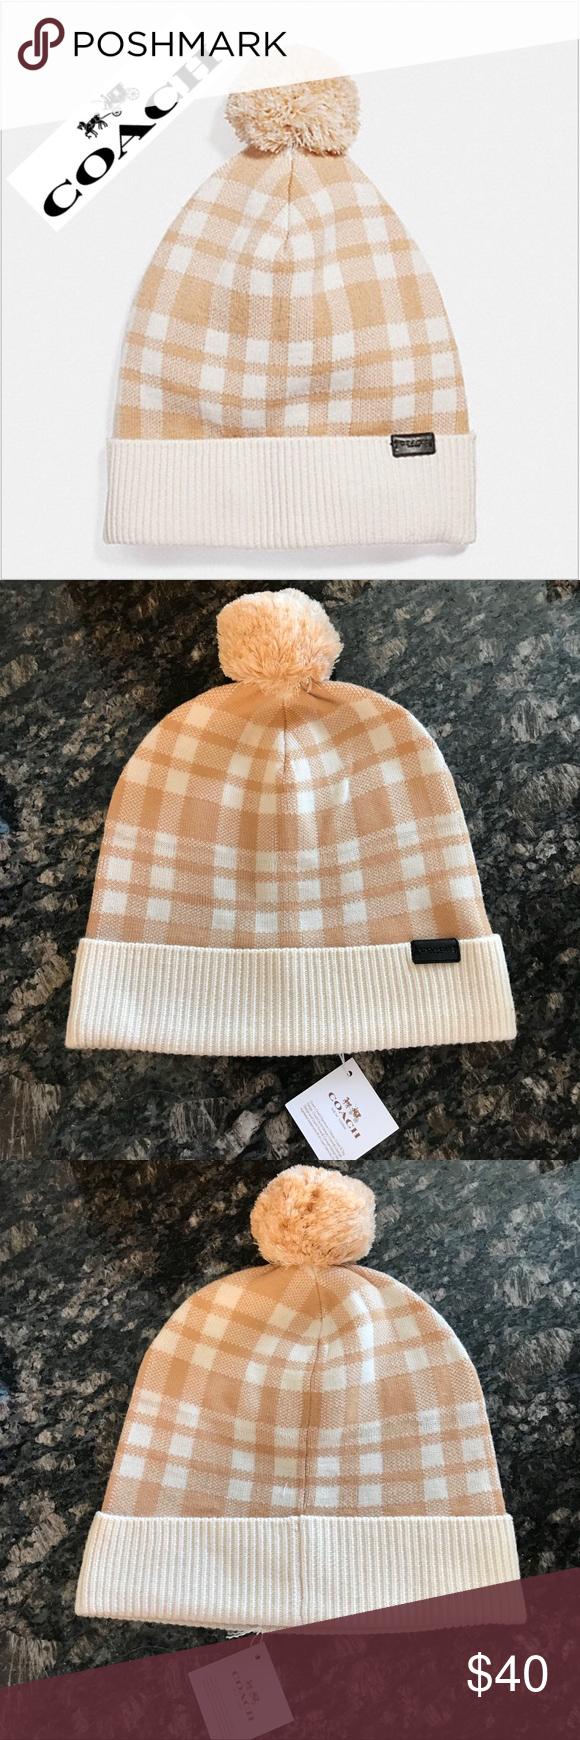 52912302a36 ❄️FIRM❄ Coach Pom Pom winter hat - caramel plaid New with tags 100%  Authentic Coach Pom Pom hat in caramel plaid Wool blend (see tag in pic)  Coach ...